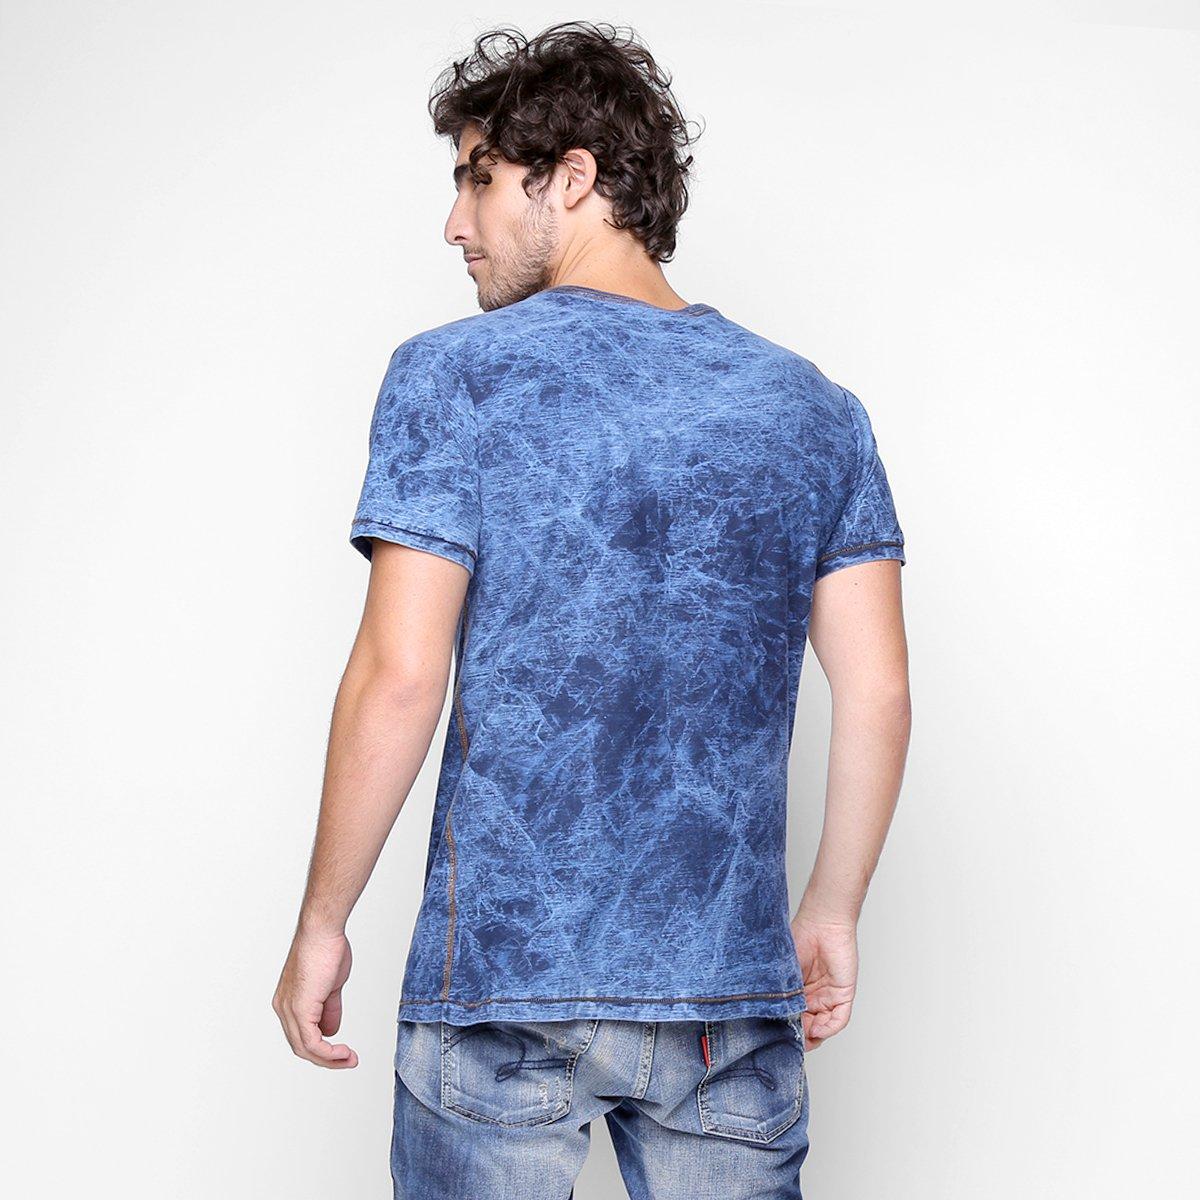 364622c16f Camiseta Reserva Marmorizada  Camiseta Reserva Marmorizada ...